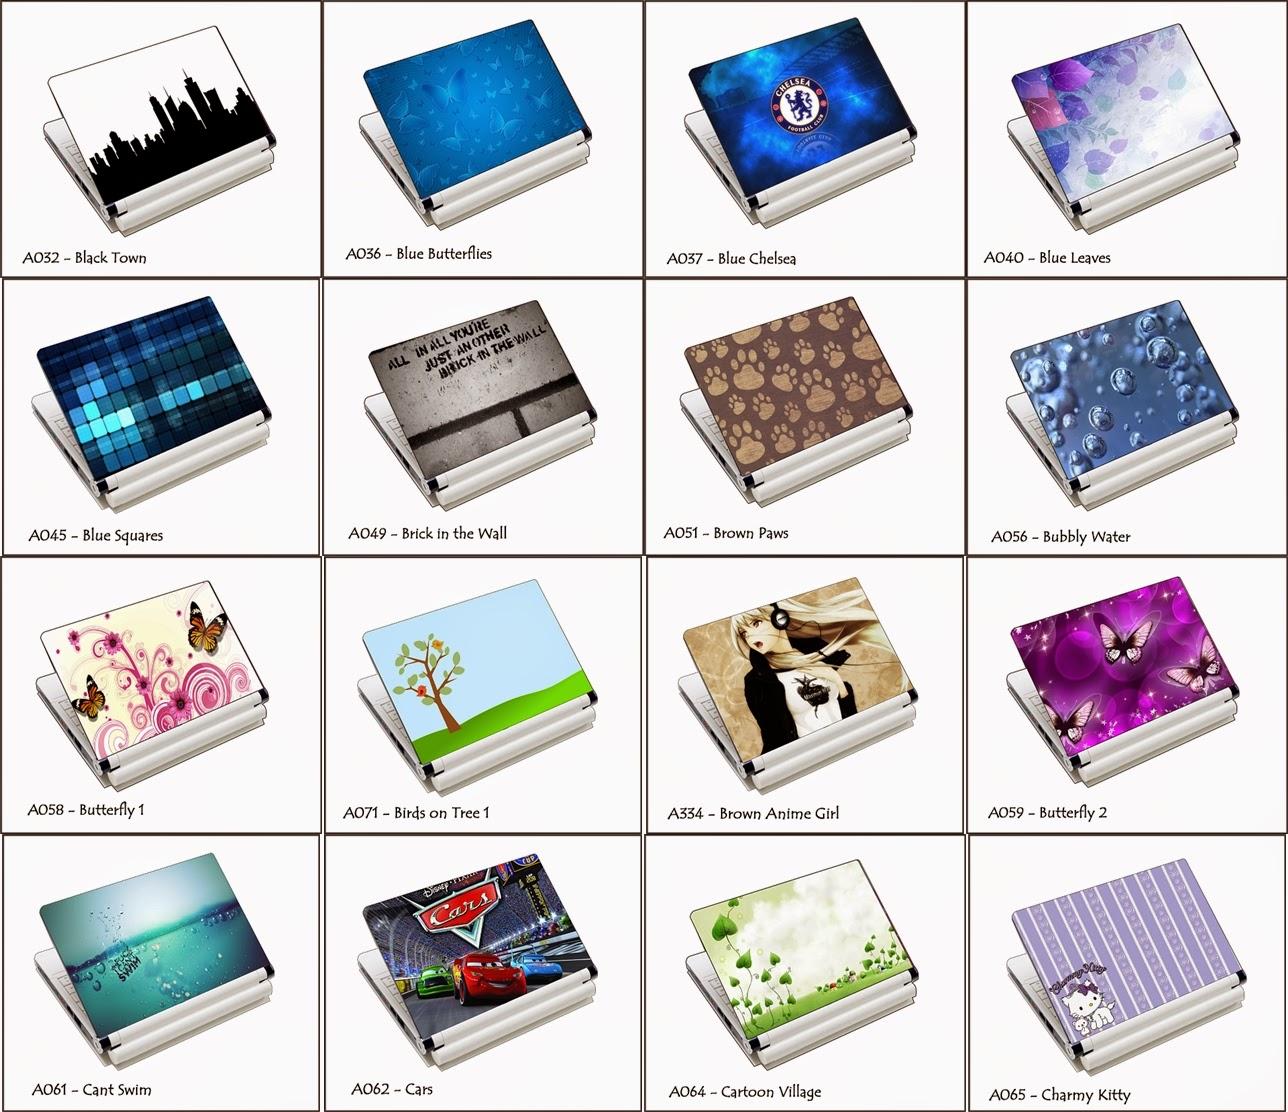 Via Ristiani Grosir Wallsticker Readystock Netbook Skin 10 Inch Garskin Laptop 14